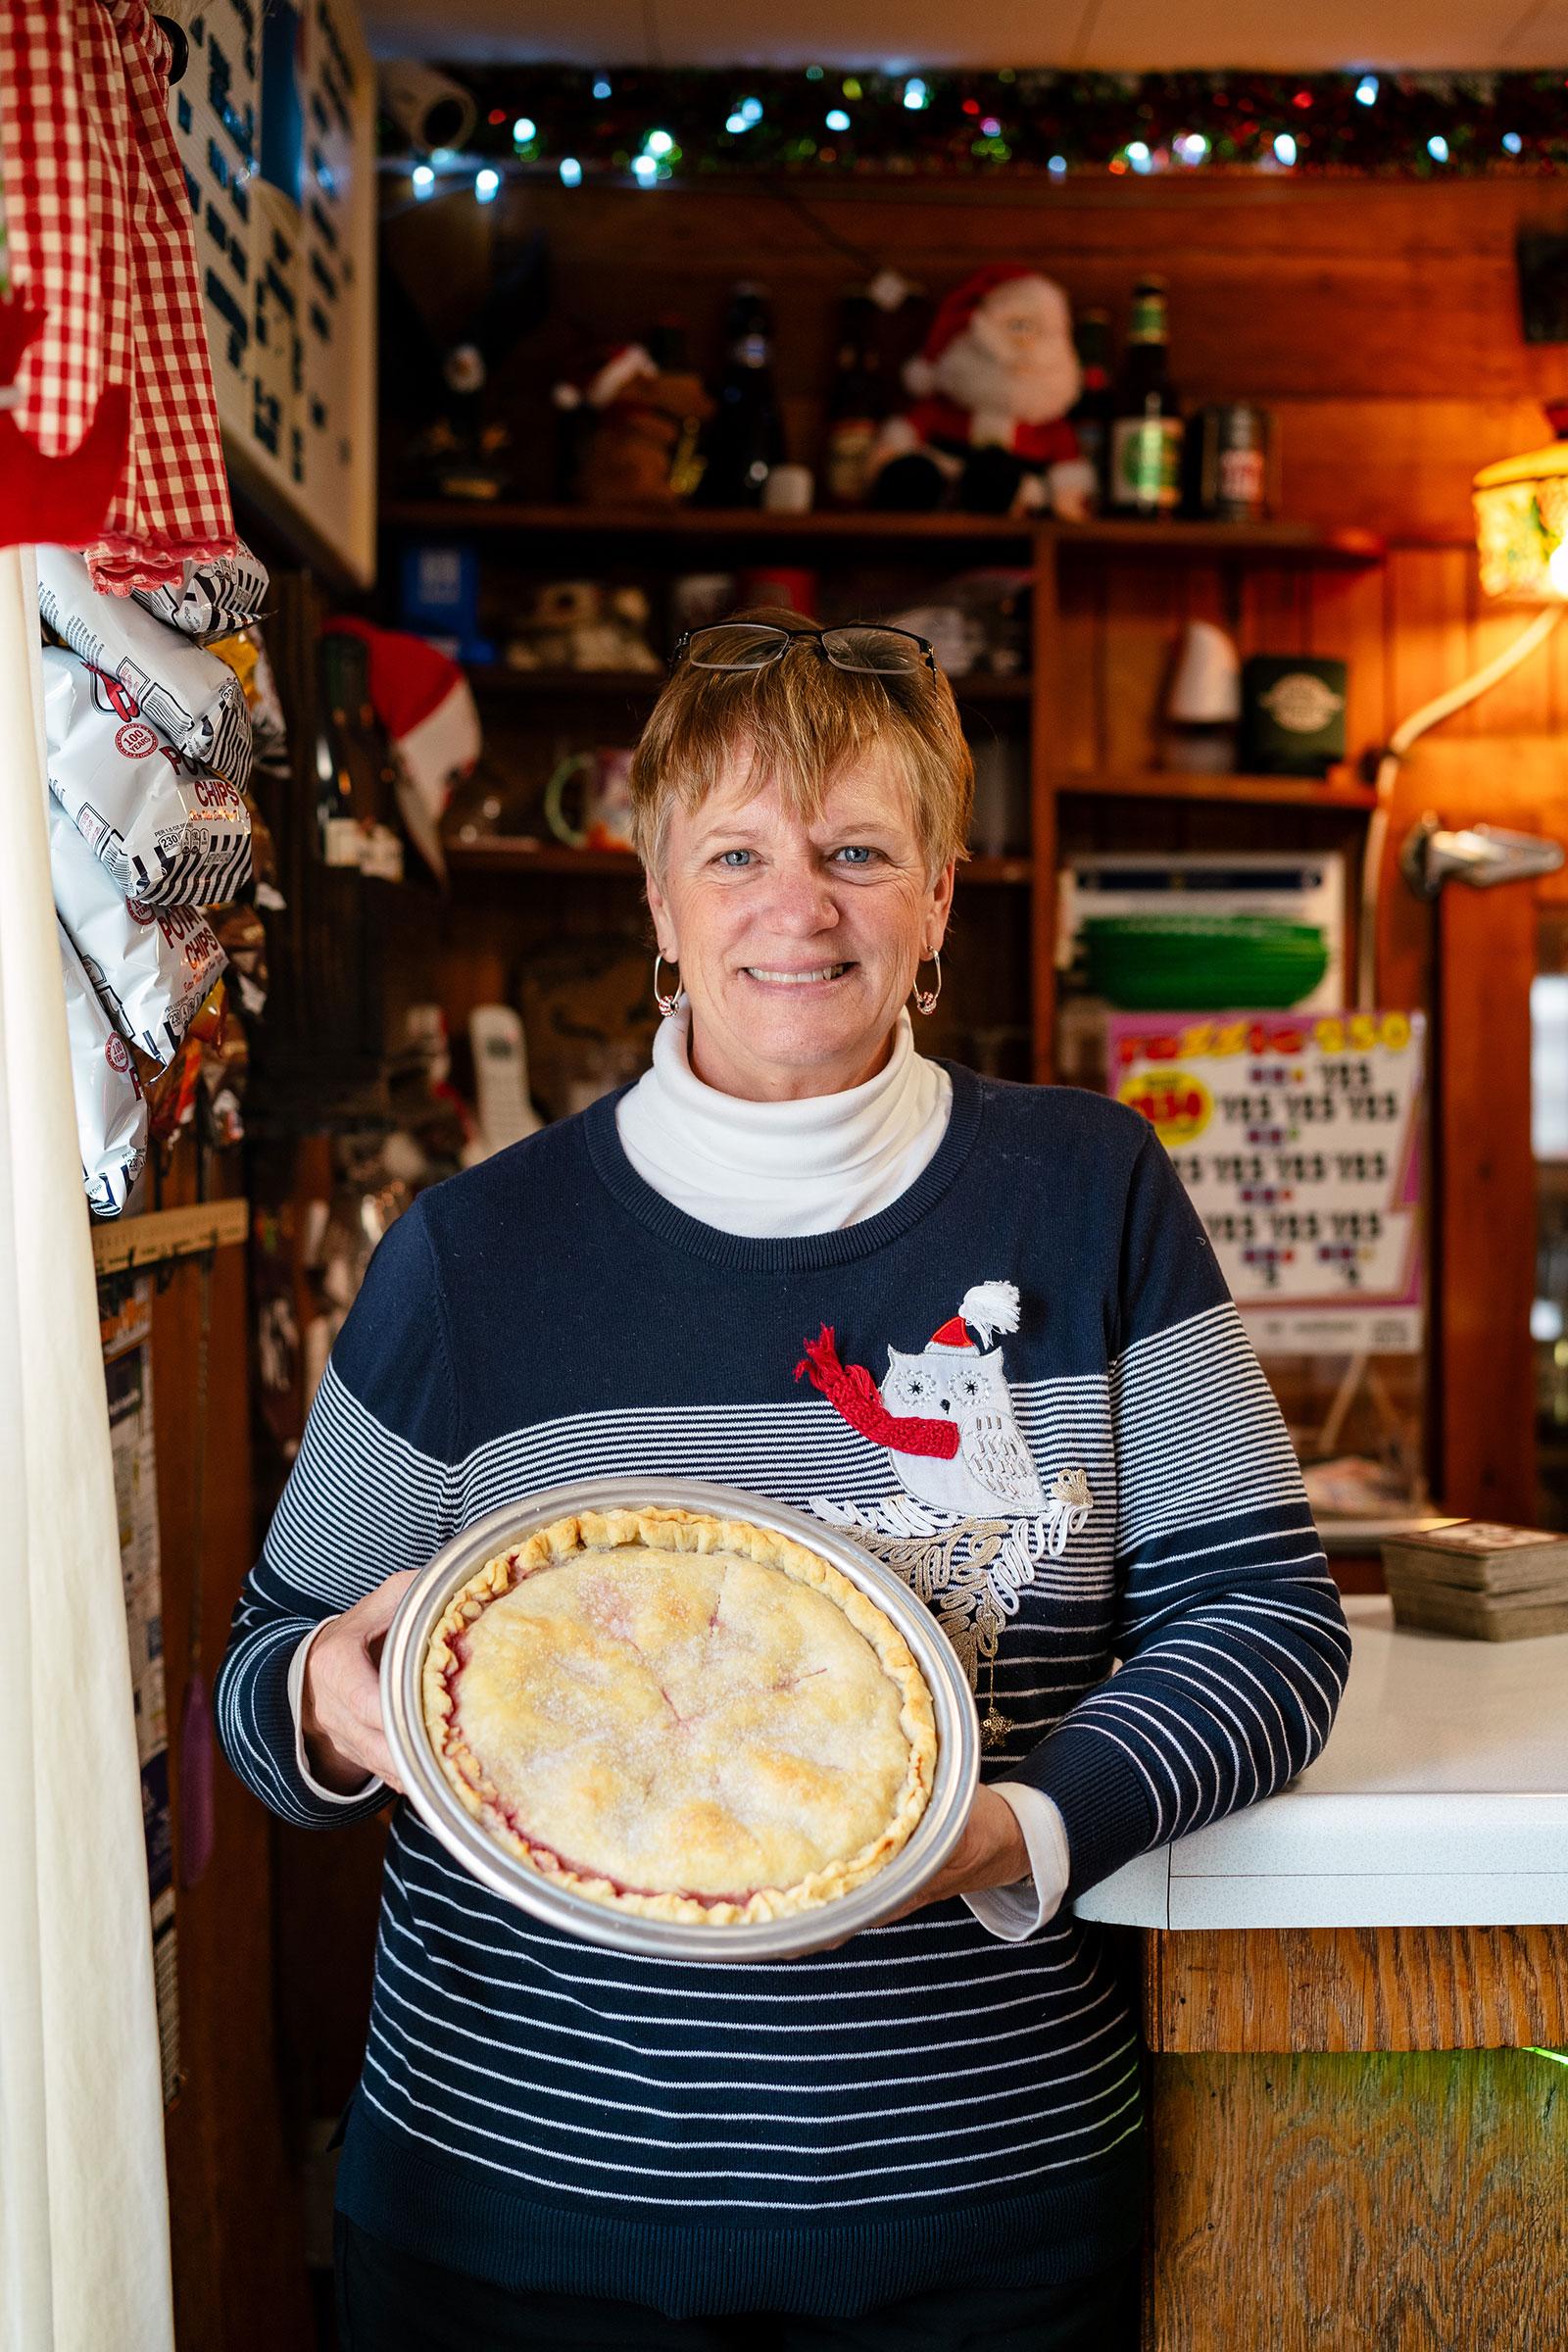 Brenda Lowe with a fresh-baked Cherry-Berry Pie. Nick Hagen